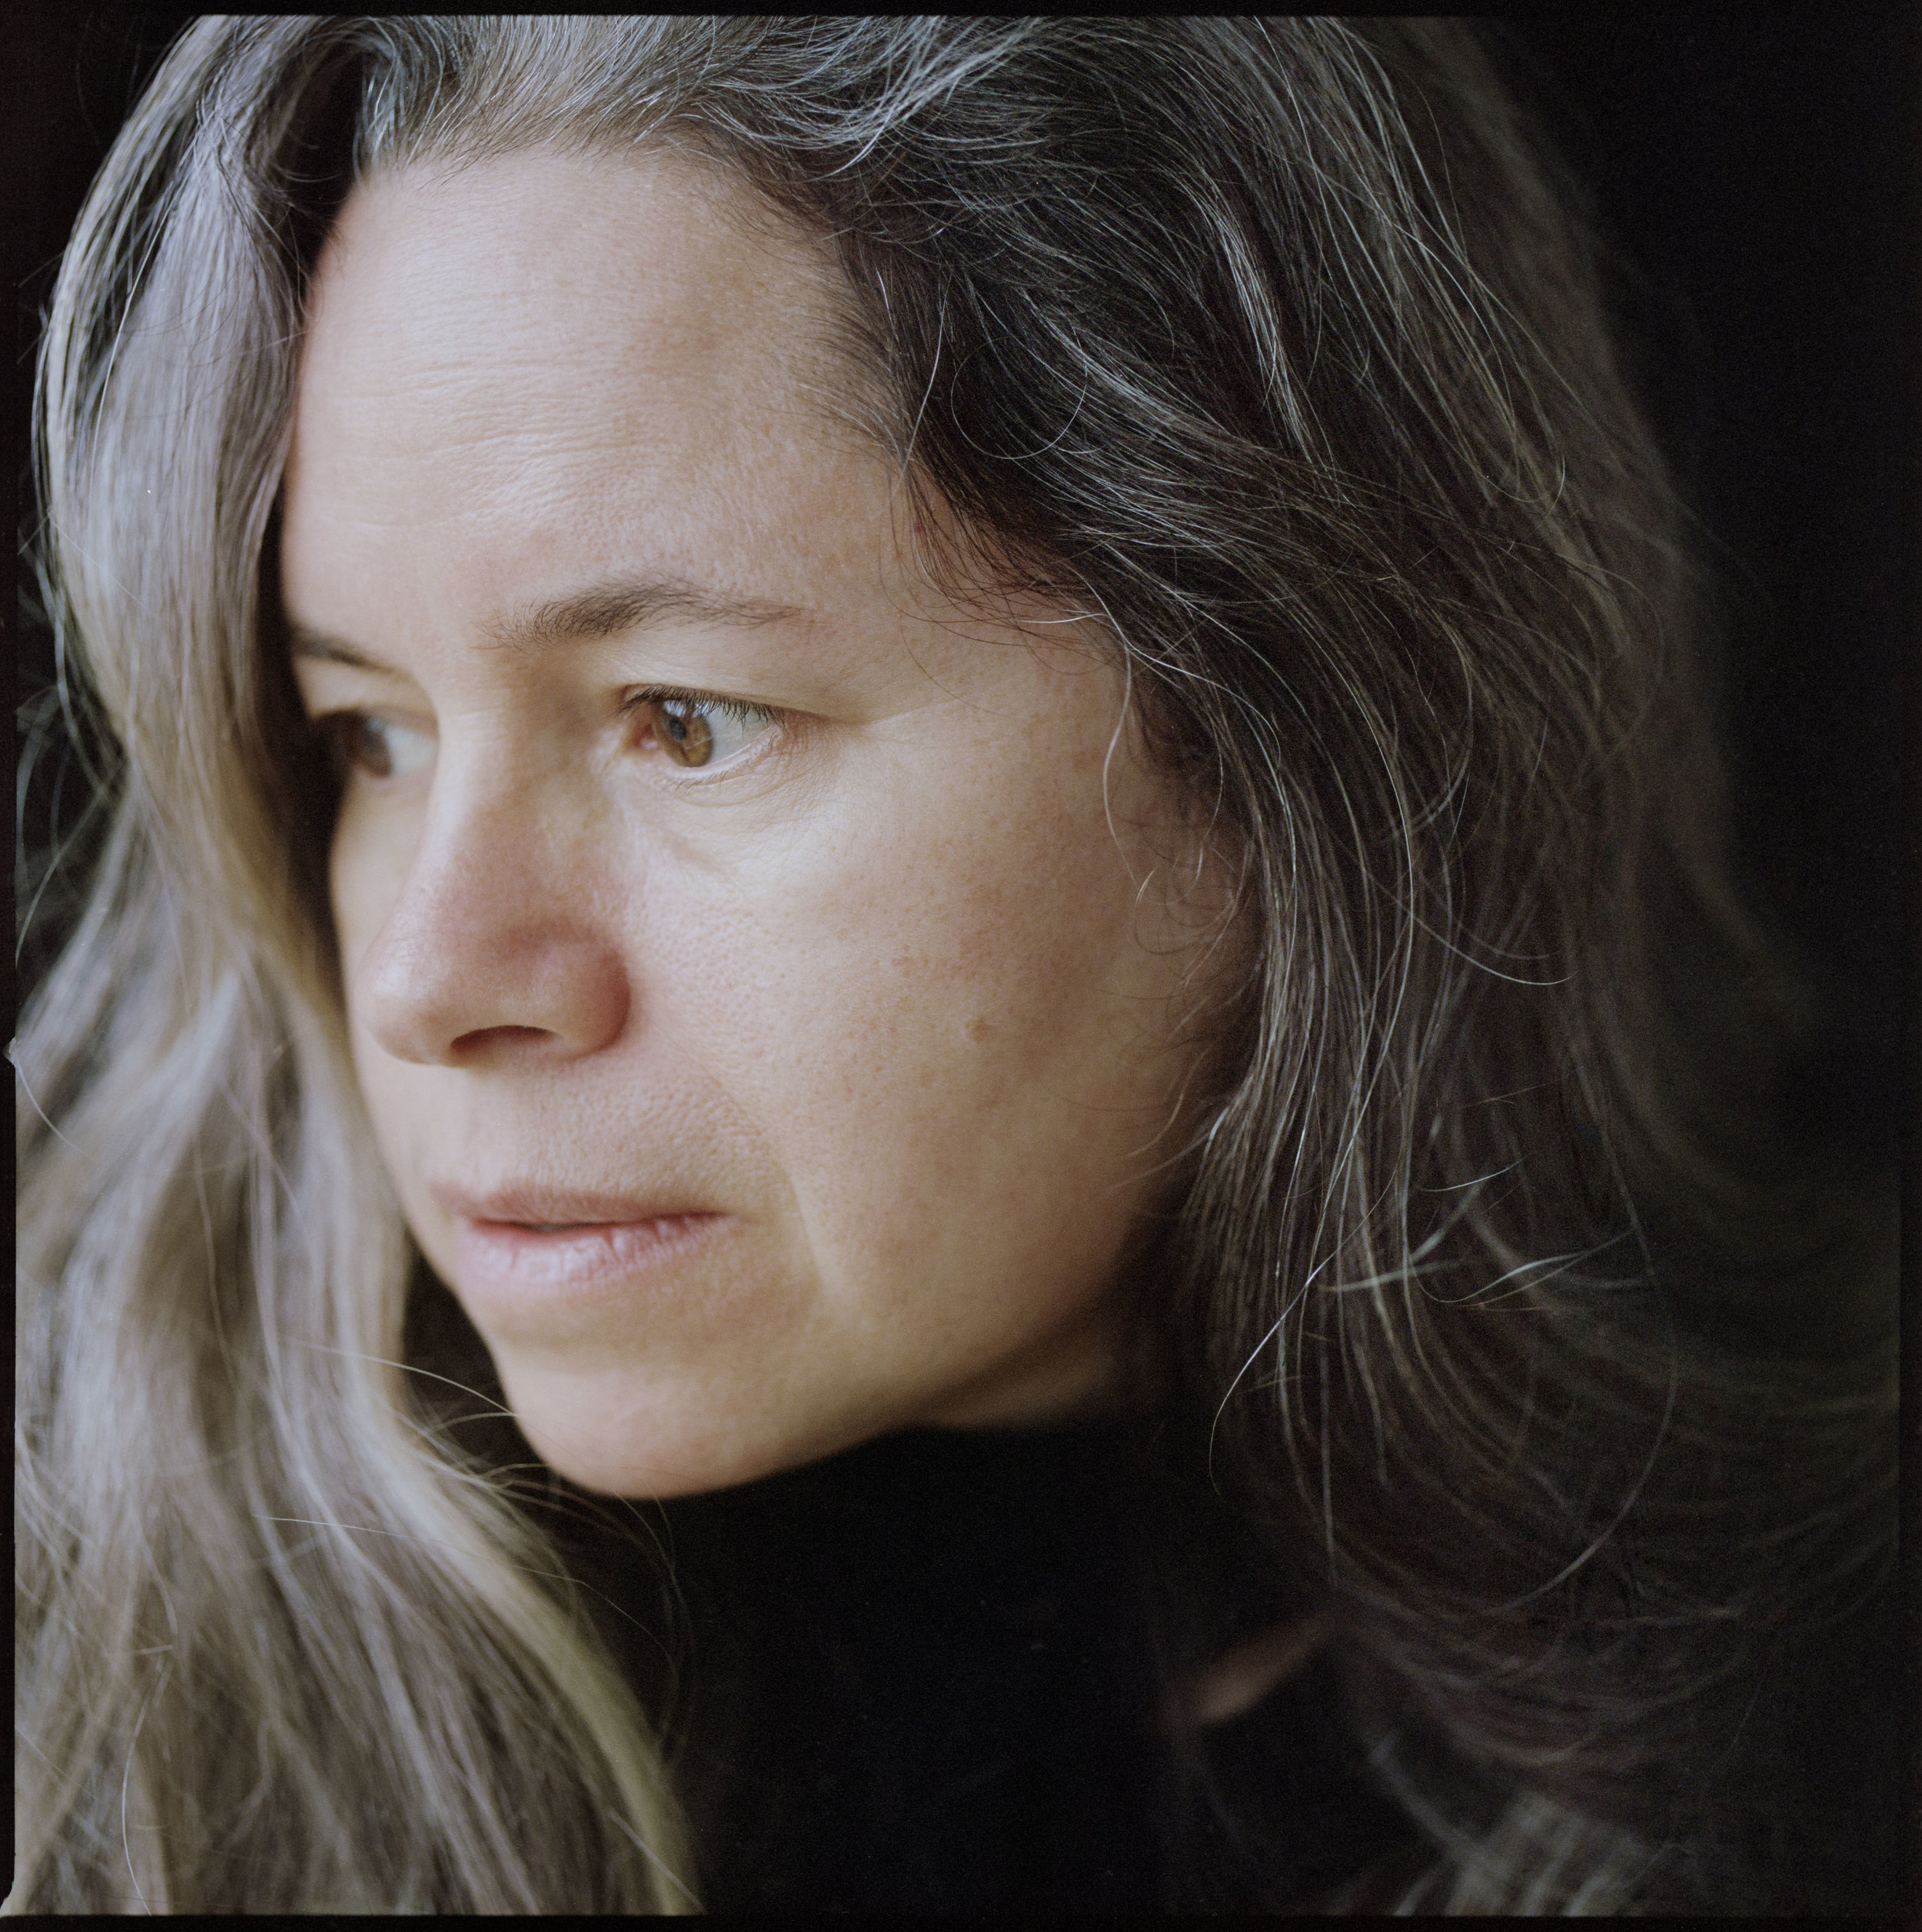 Natalie Merchant 1 - CREDIT Jacob Blickenstaff.jpg